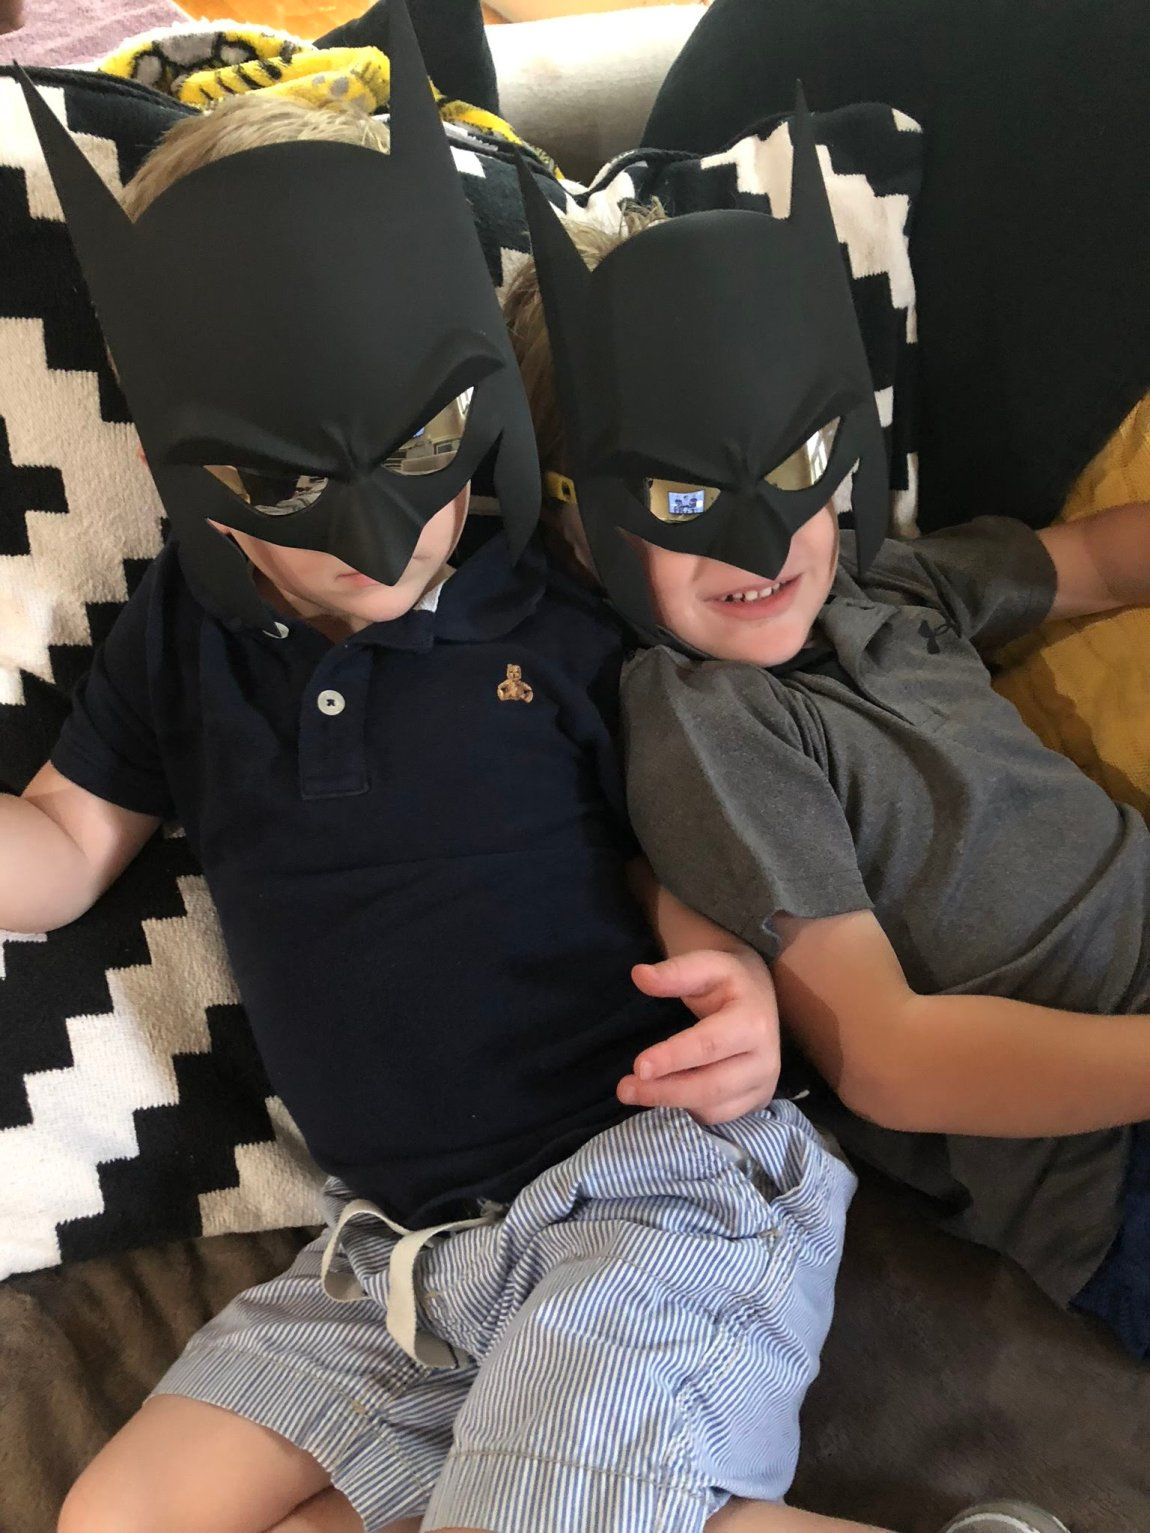 Here comes batman(s)!